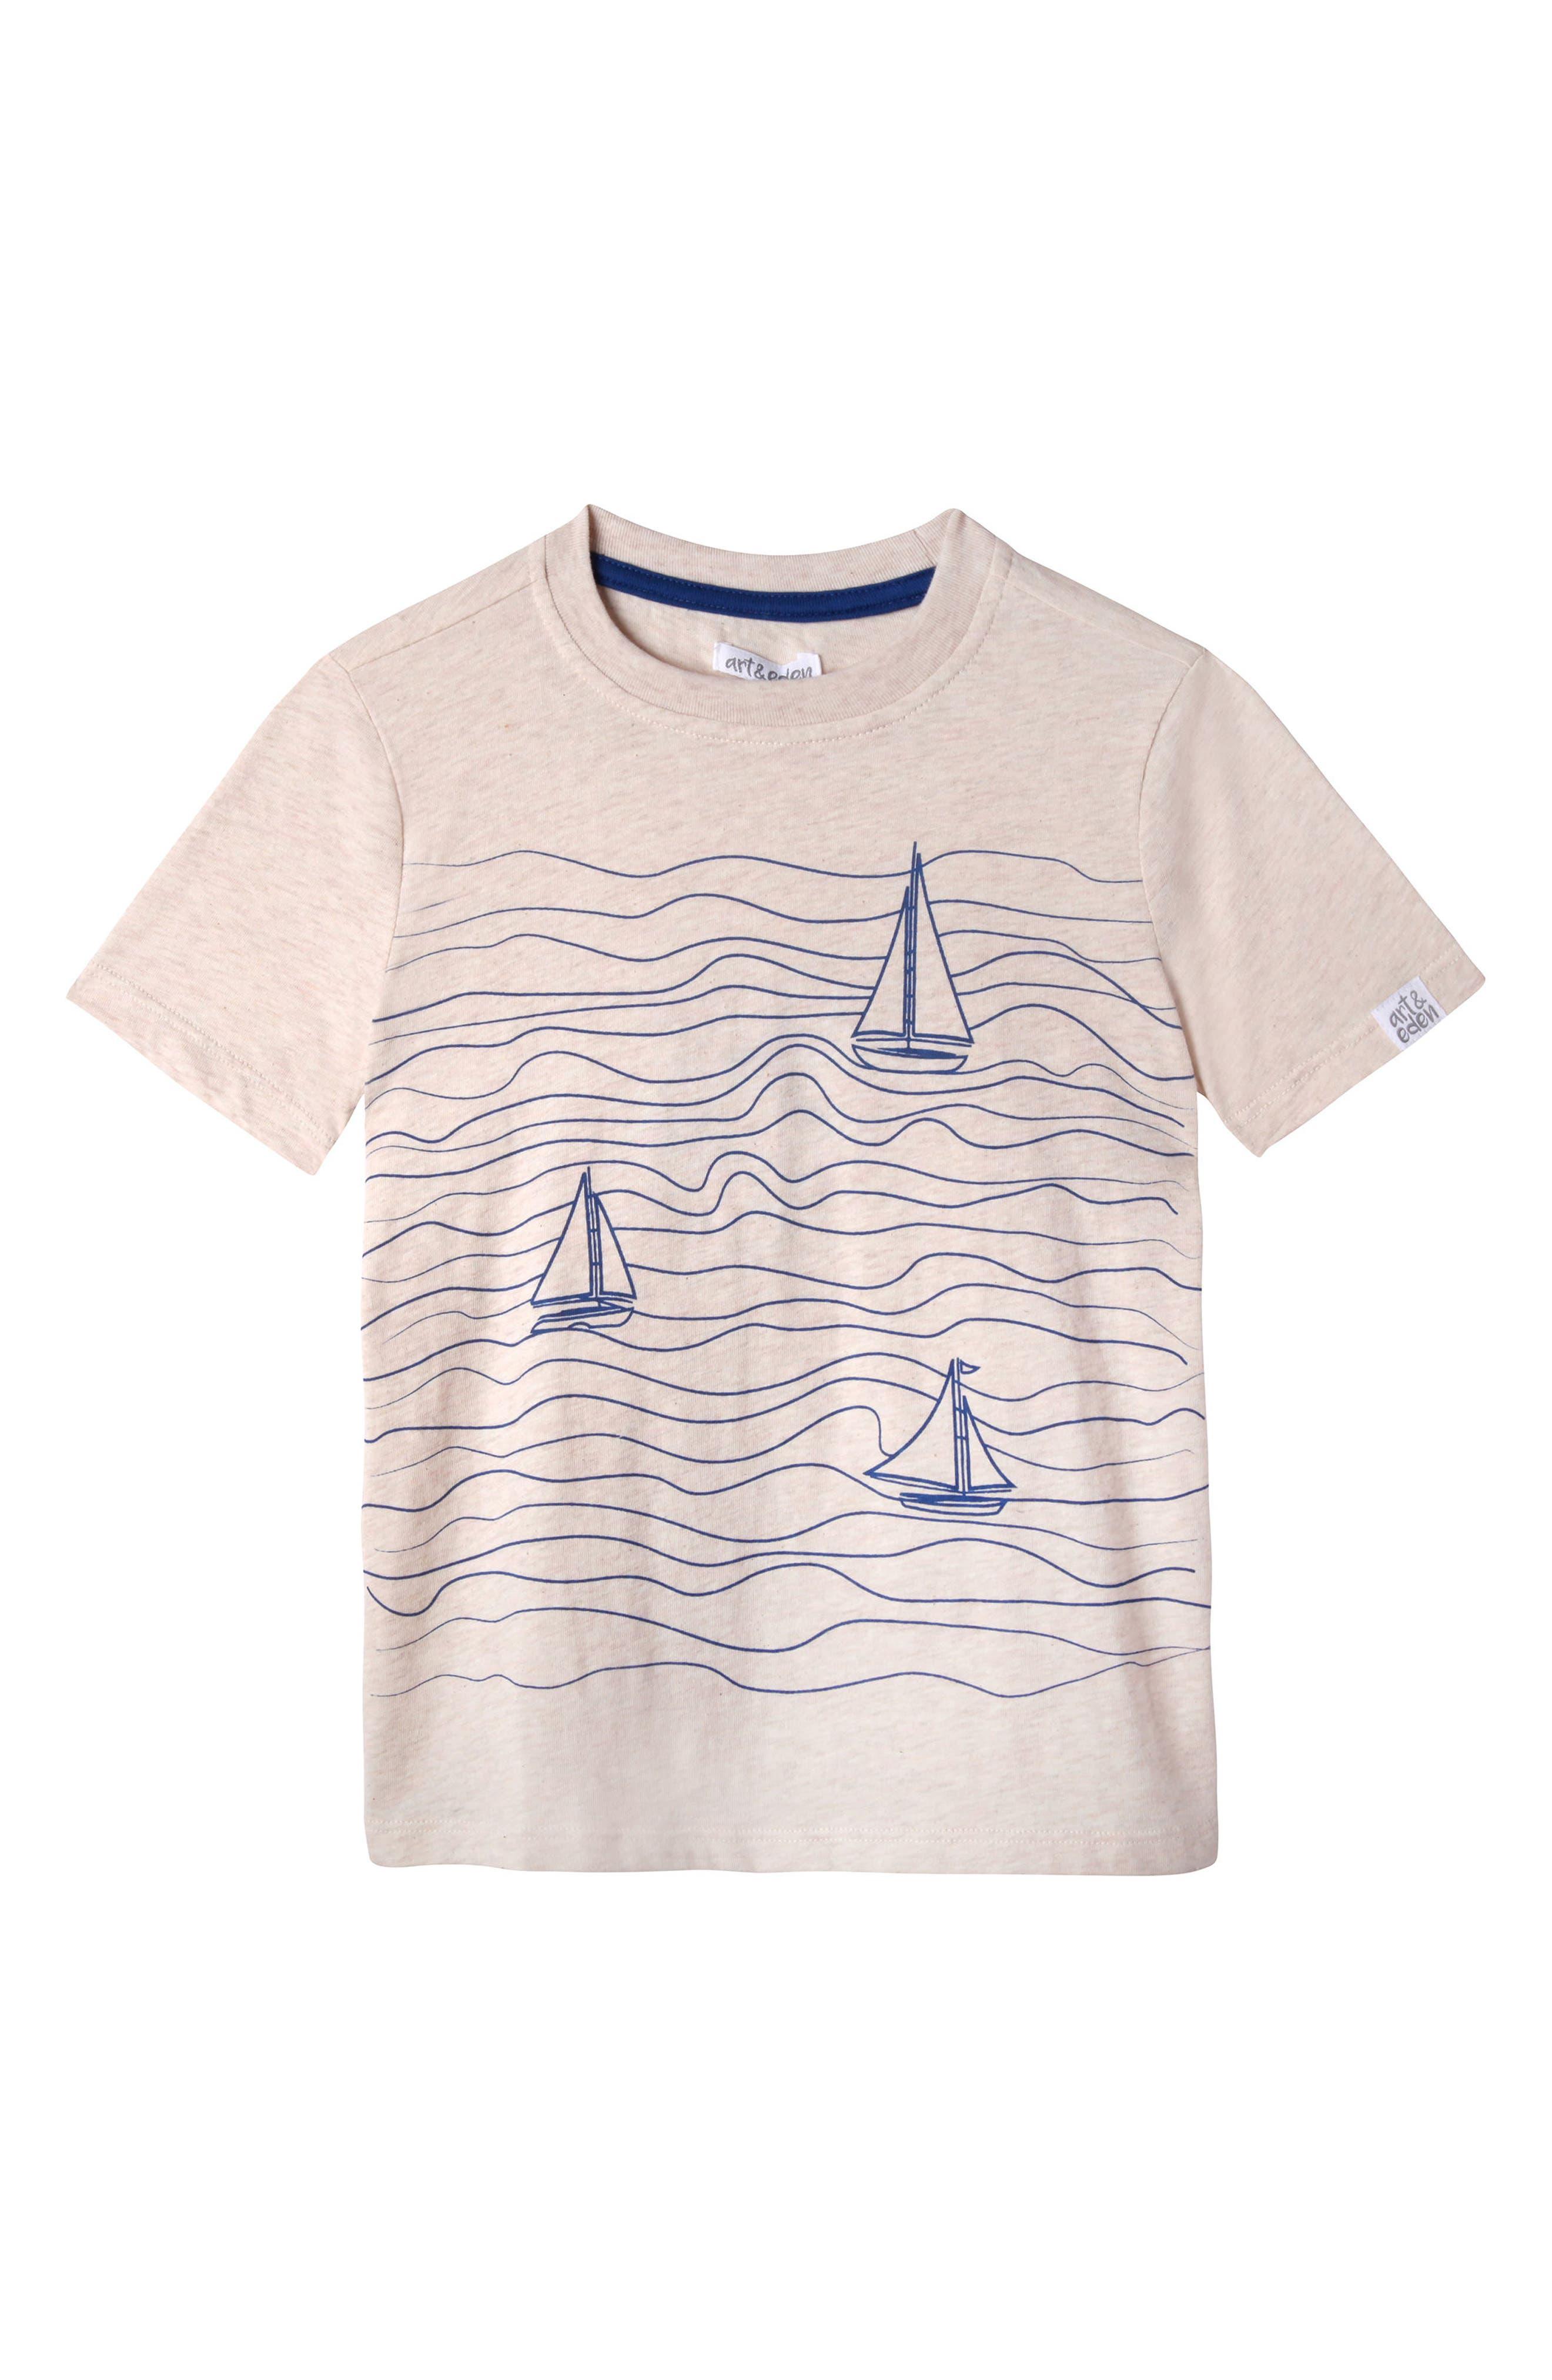 Main Image - Art & Eden Jacob Sailboat Organic Cotton T-Shirt (Toddler Boys, Little Boys & Big Boys)